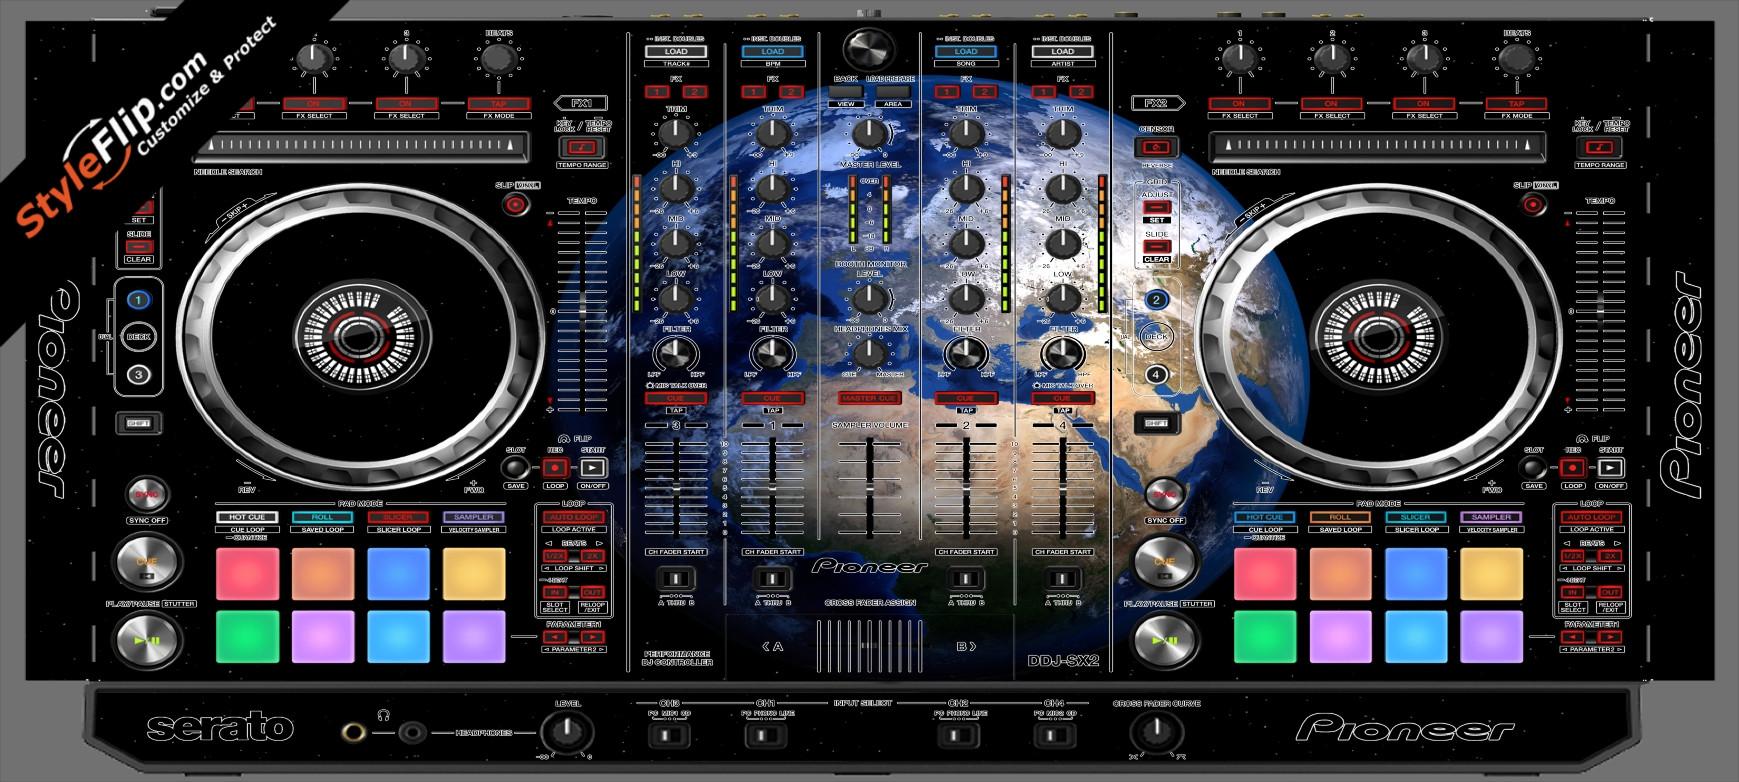 Earthling  Pioneer DDJ-SX2